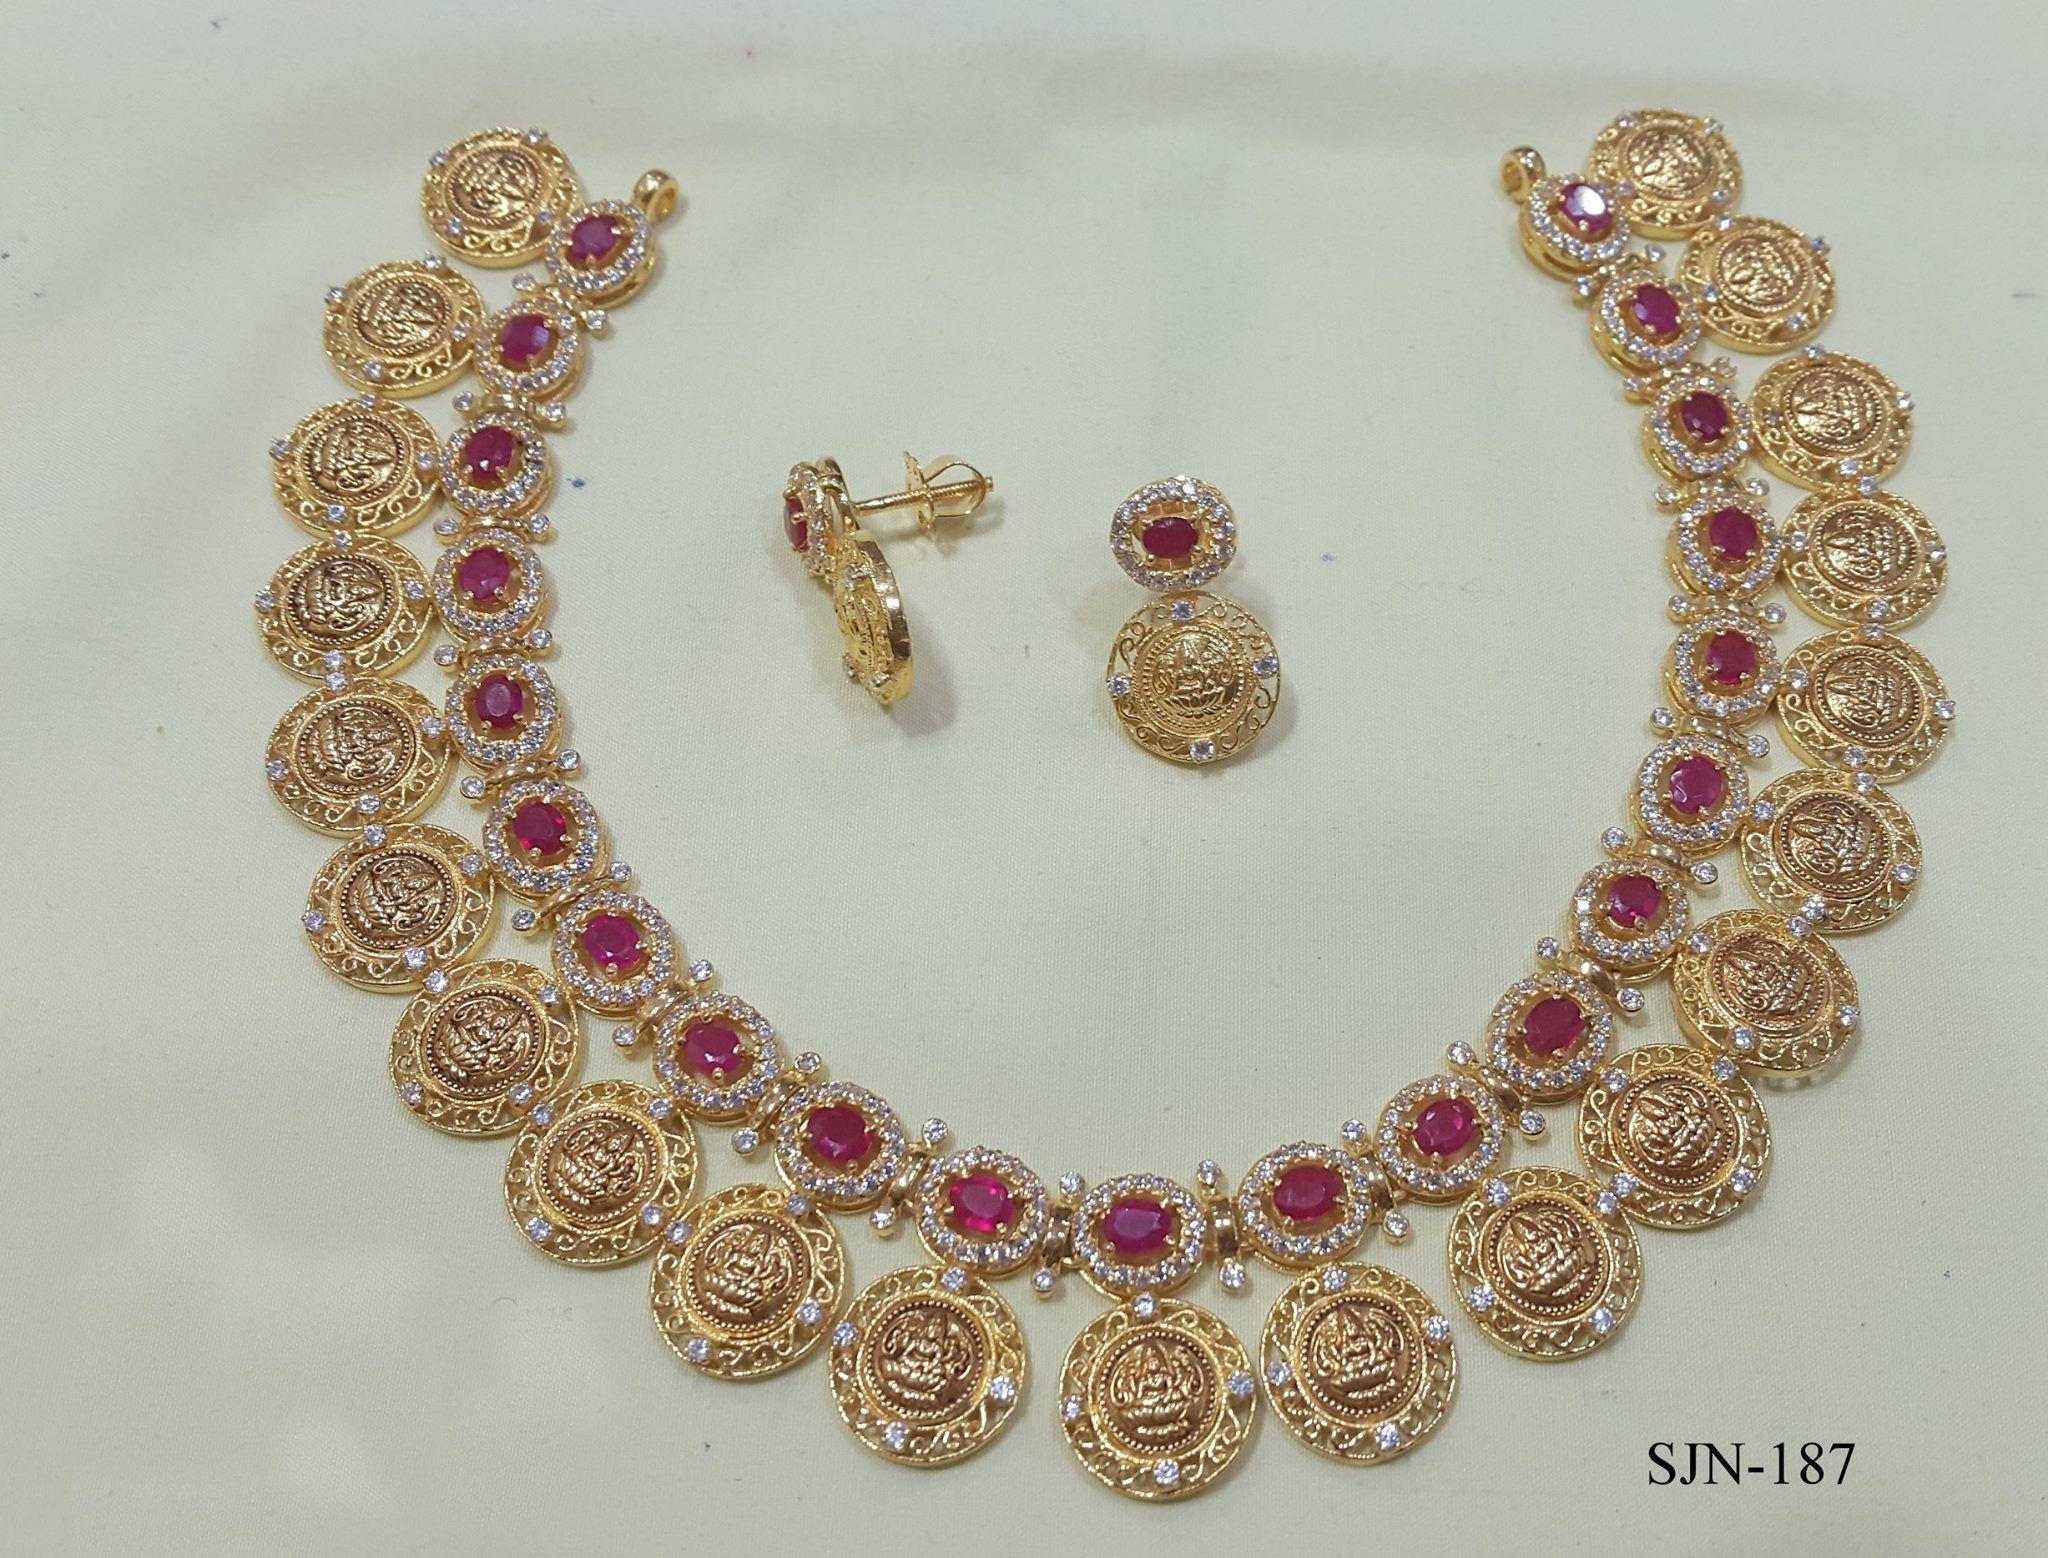 Lakshmi kasu mala necklace set in gms with red stones adorned